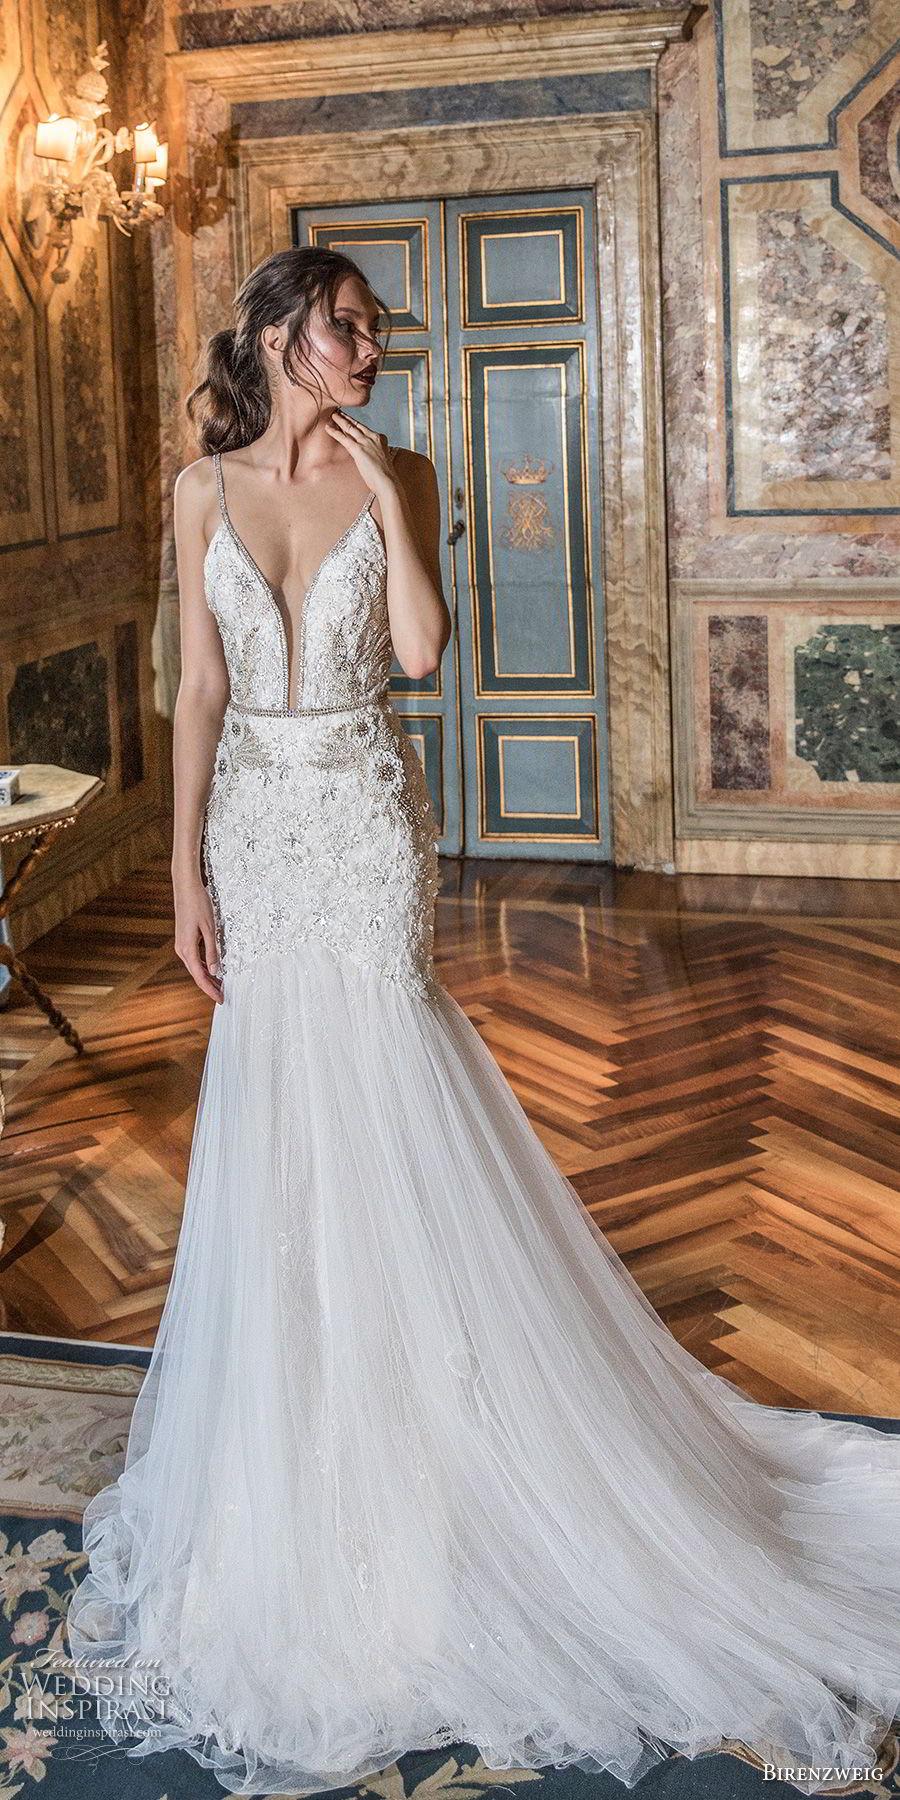 birenzweig 2018 bridal spaghetti strap deep plunging sweetheart neckline heavily embellished bodice sexy elegant trumpet wedding dress open v back chapel train (15) mv